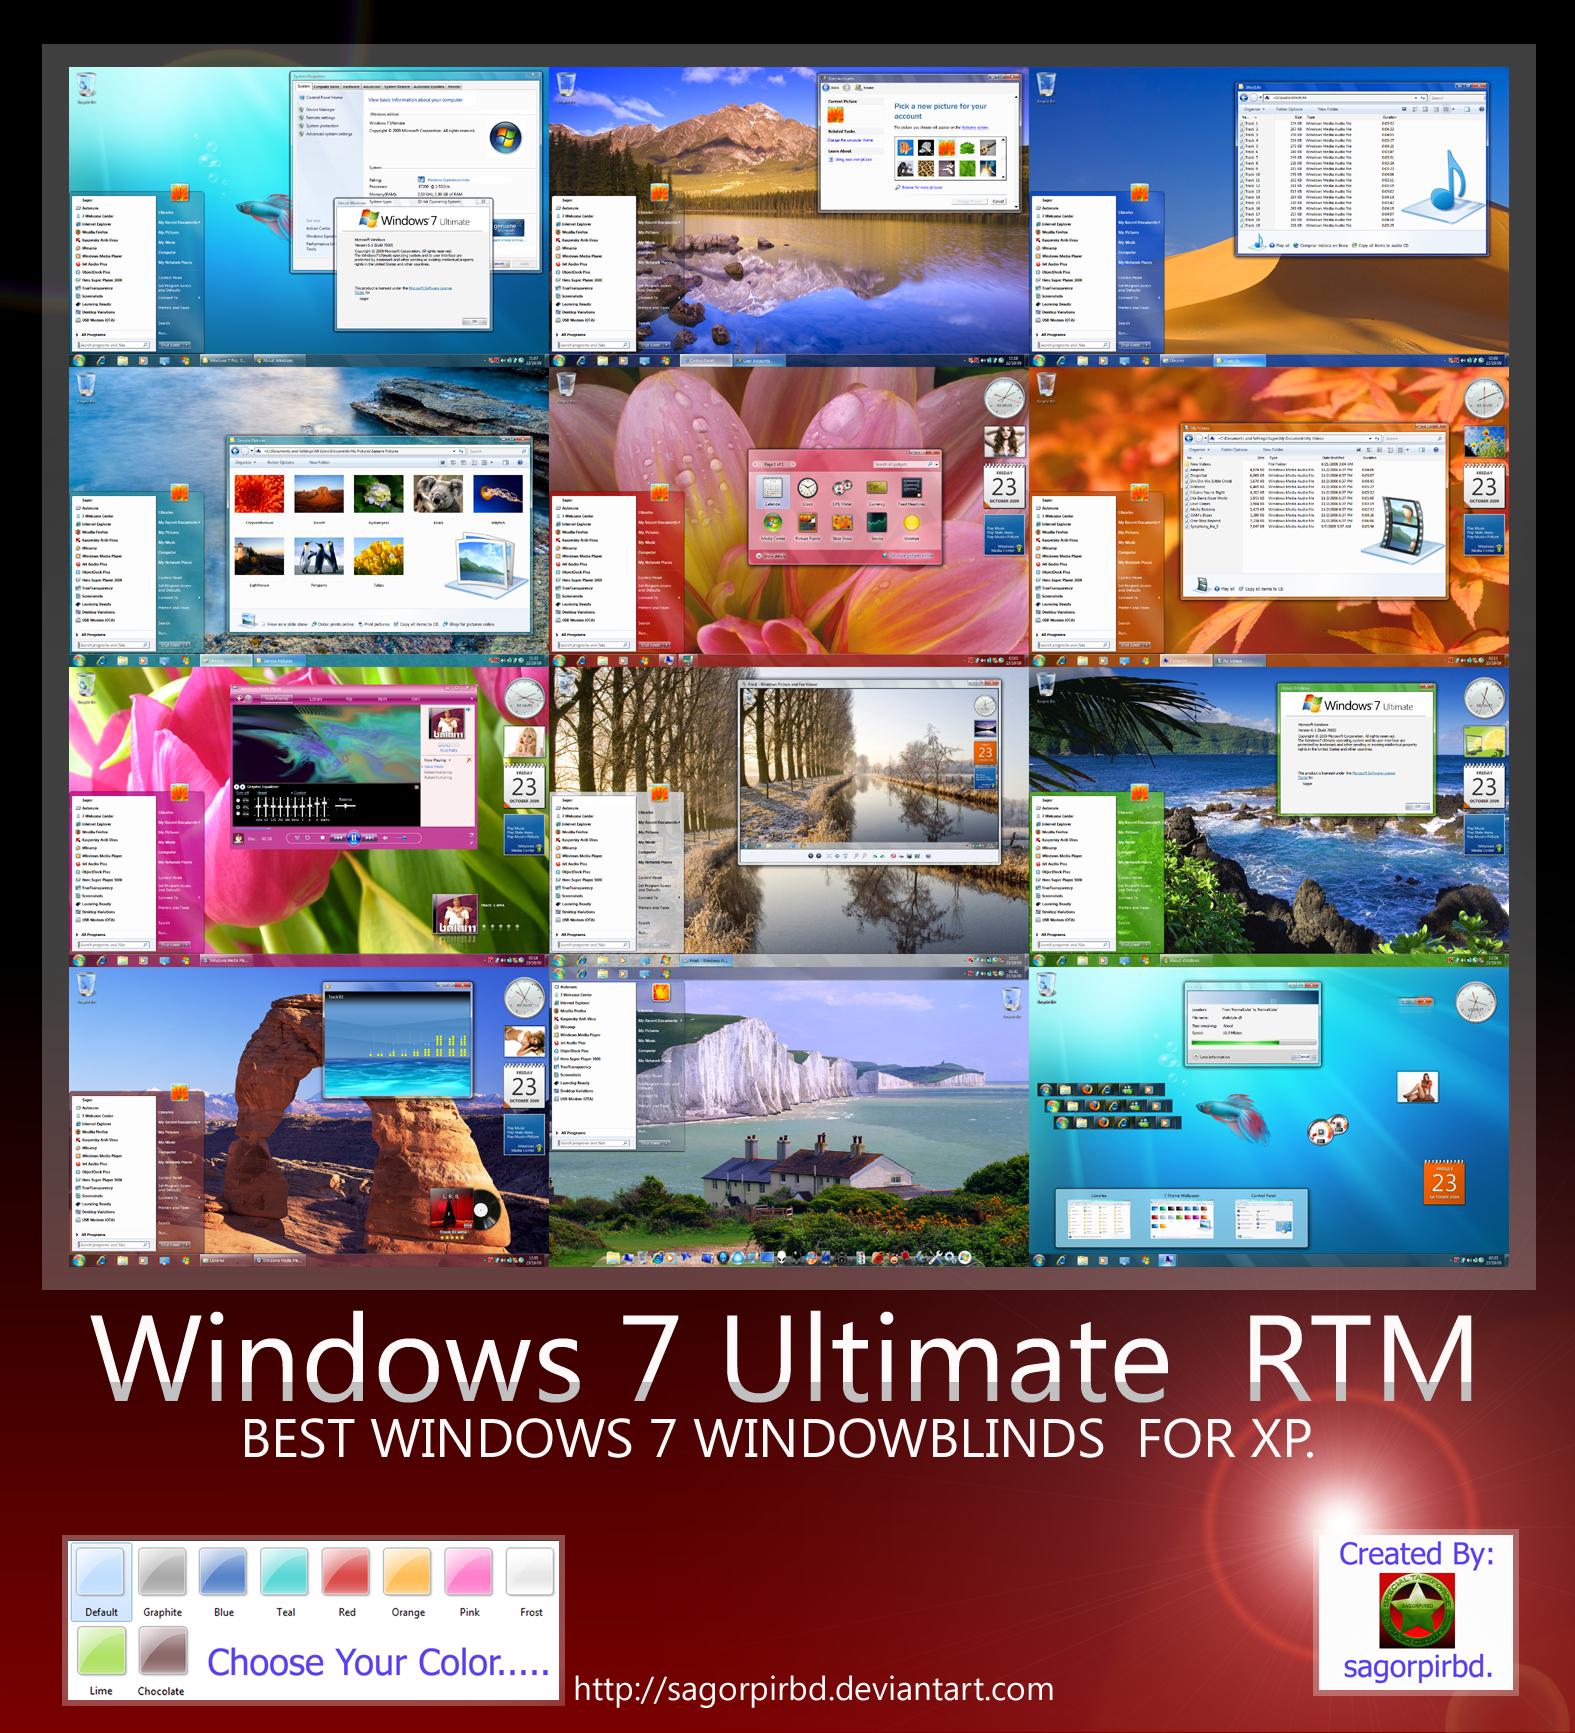 Windows 7 Ultimate RTM